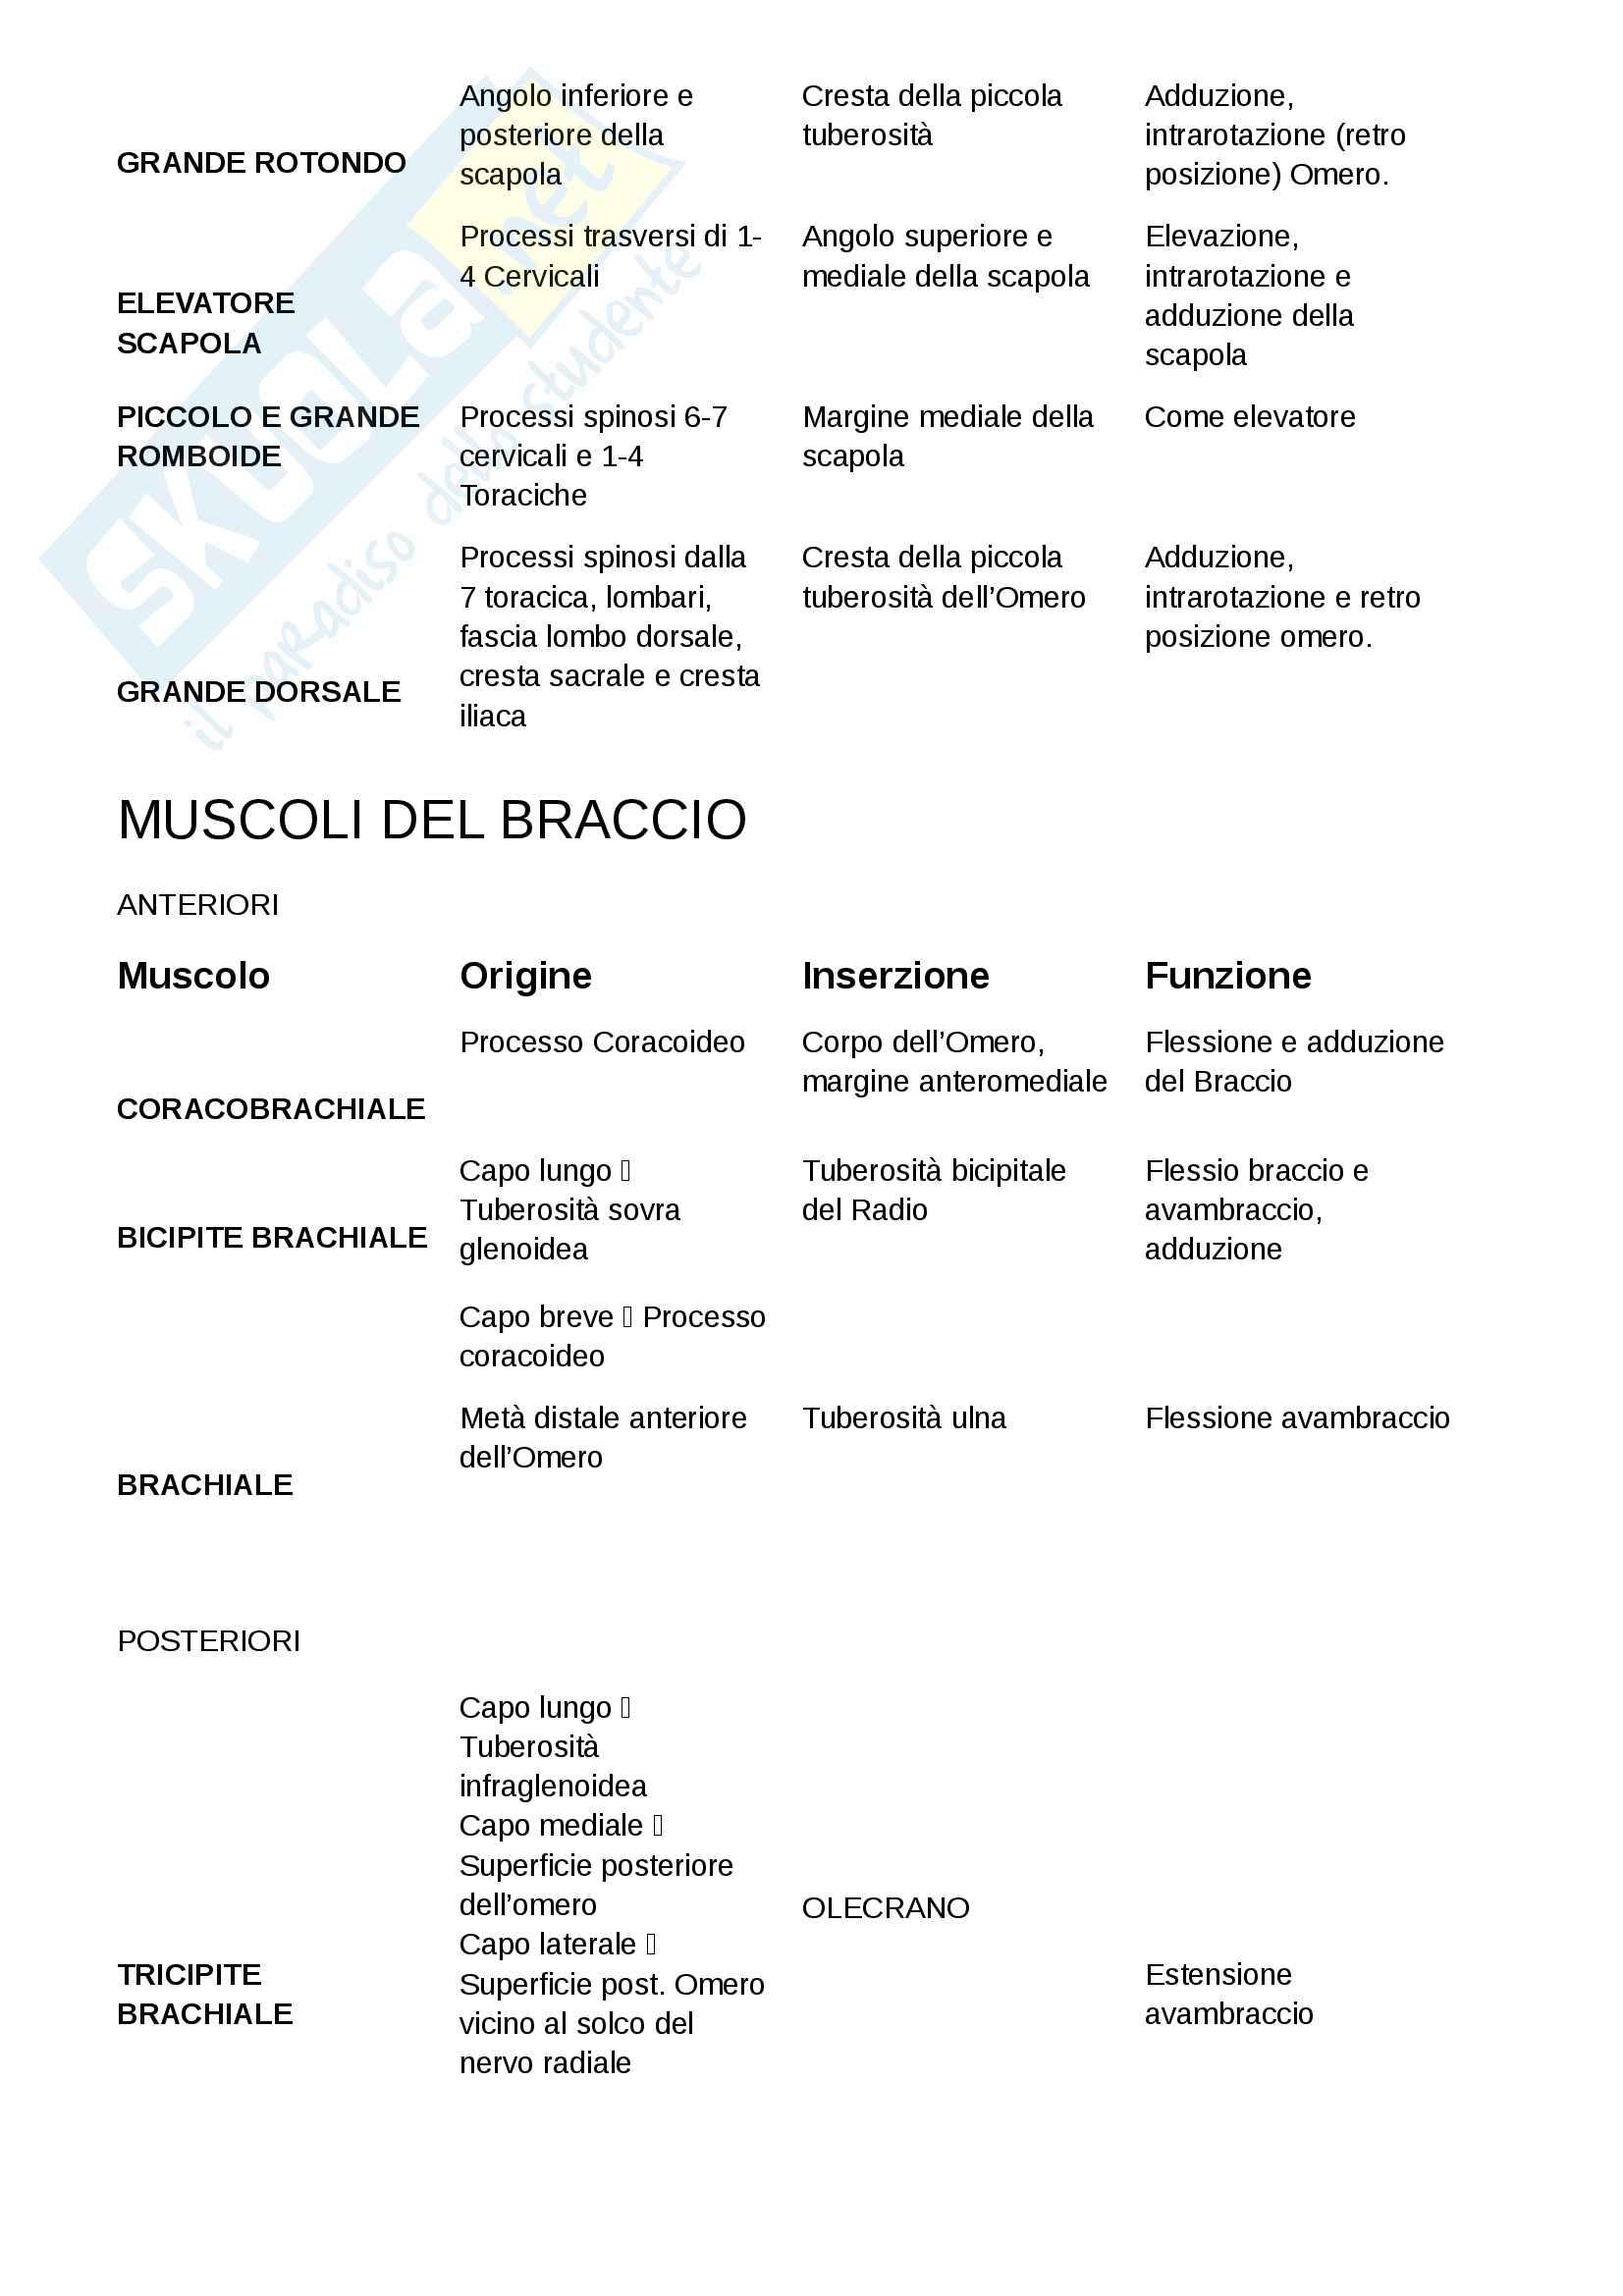 Muscoli, Anatomia Pag. 2